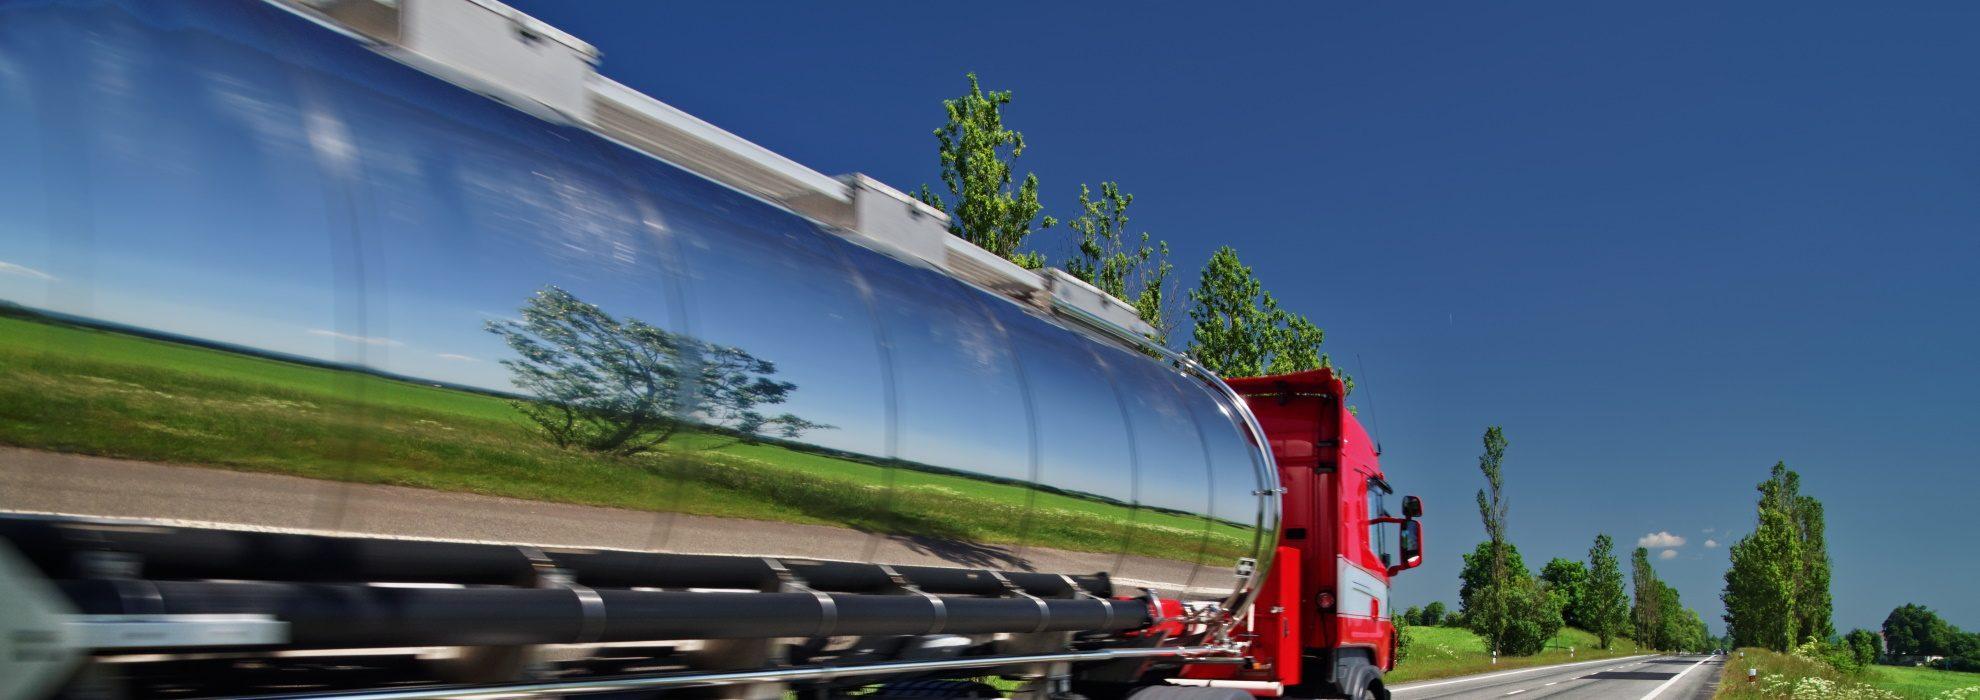 ferrol gas domicilio